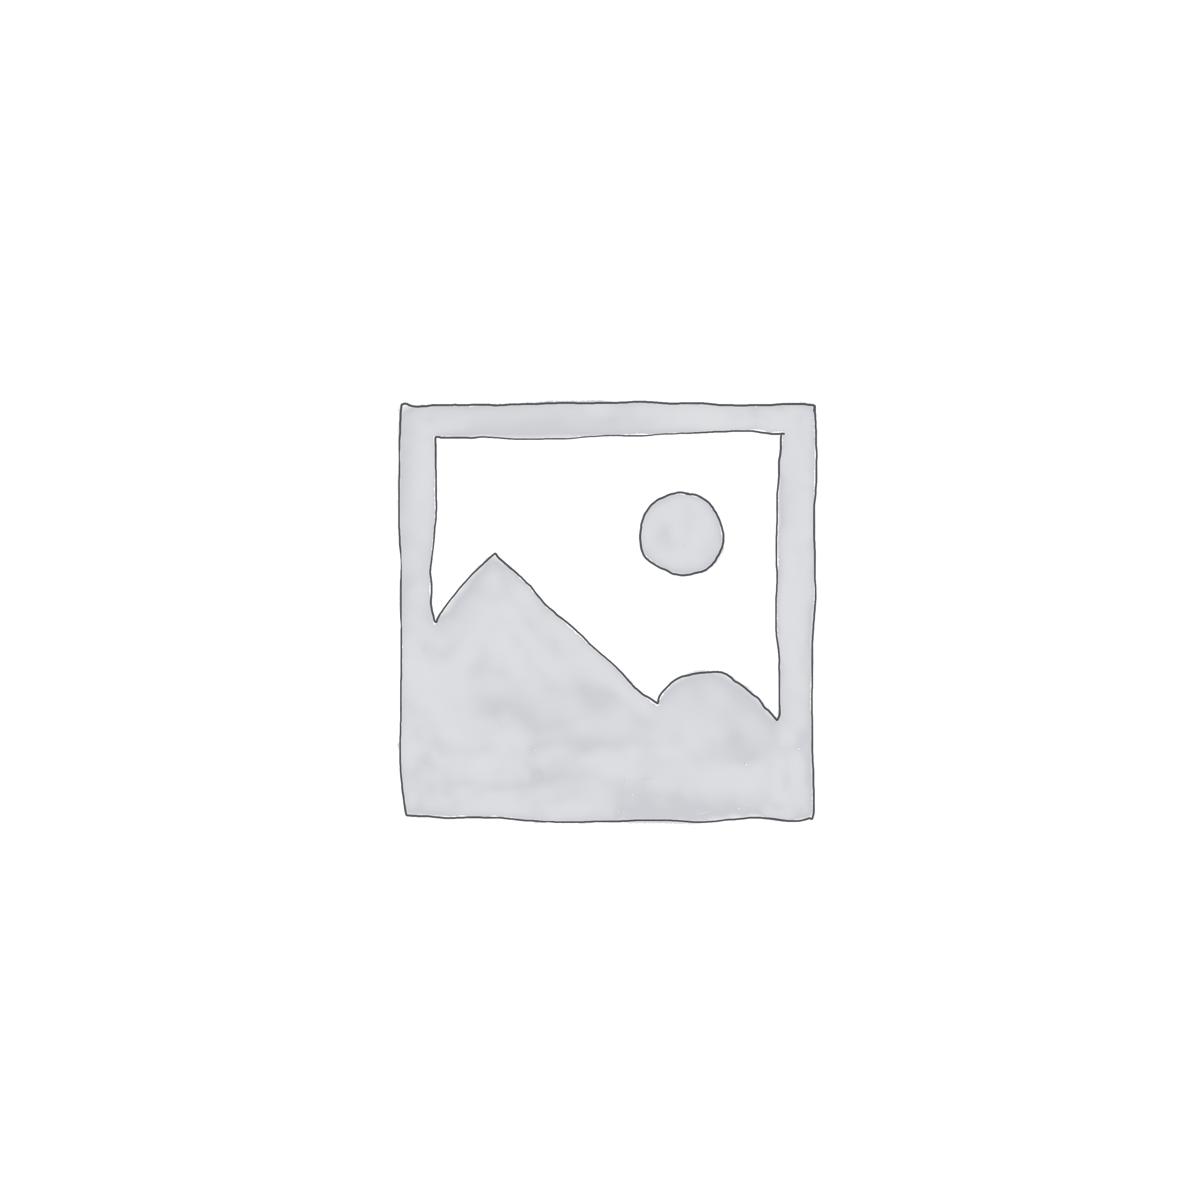 Videos – E-Series IP Cameras